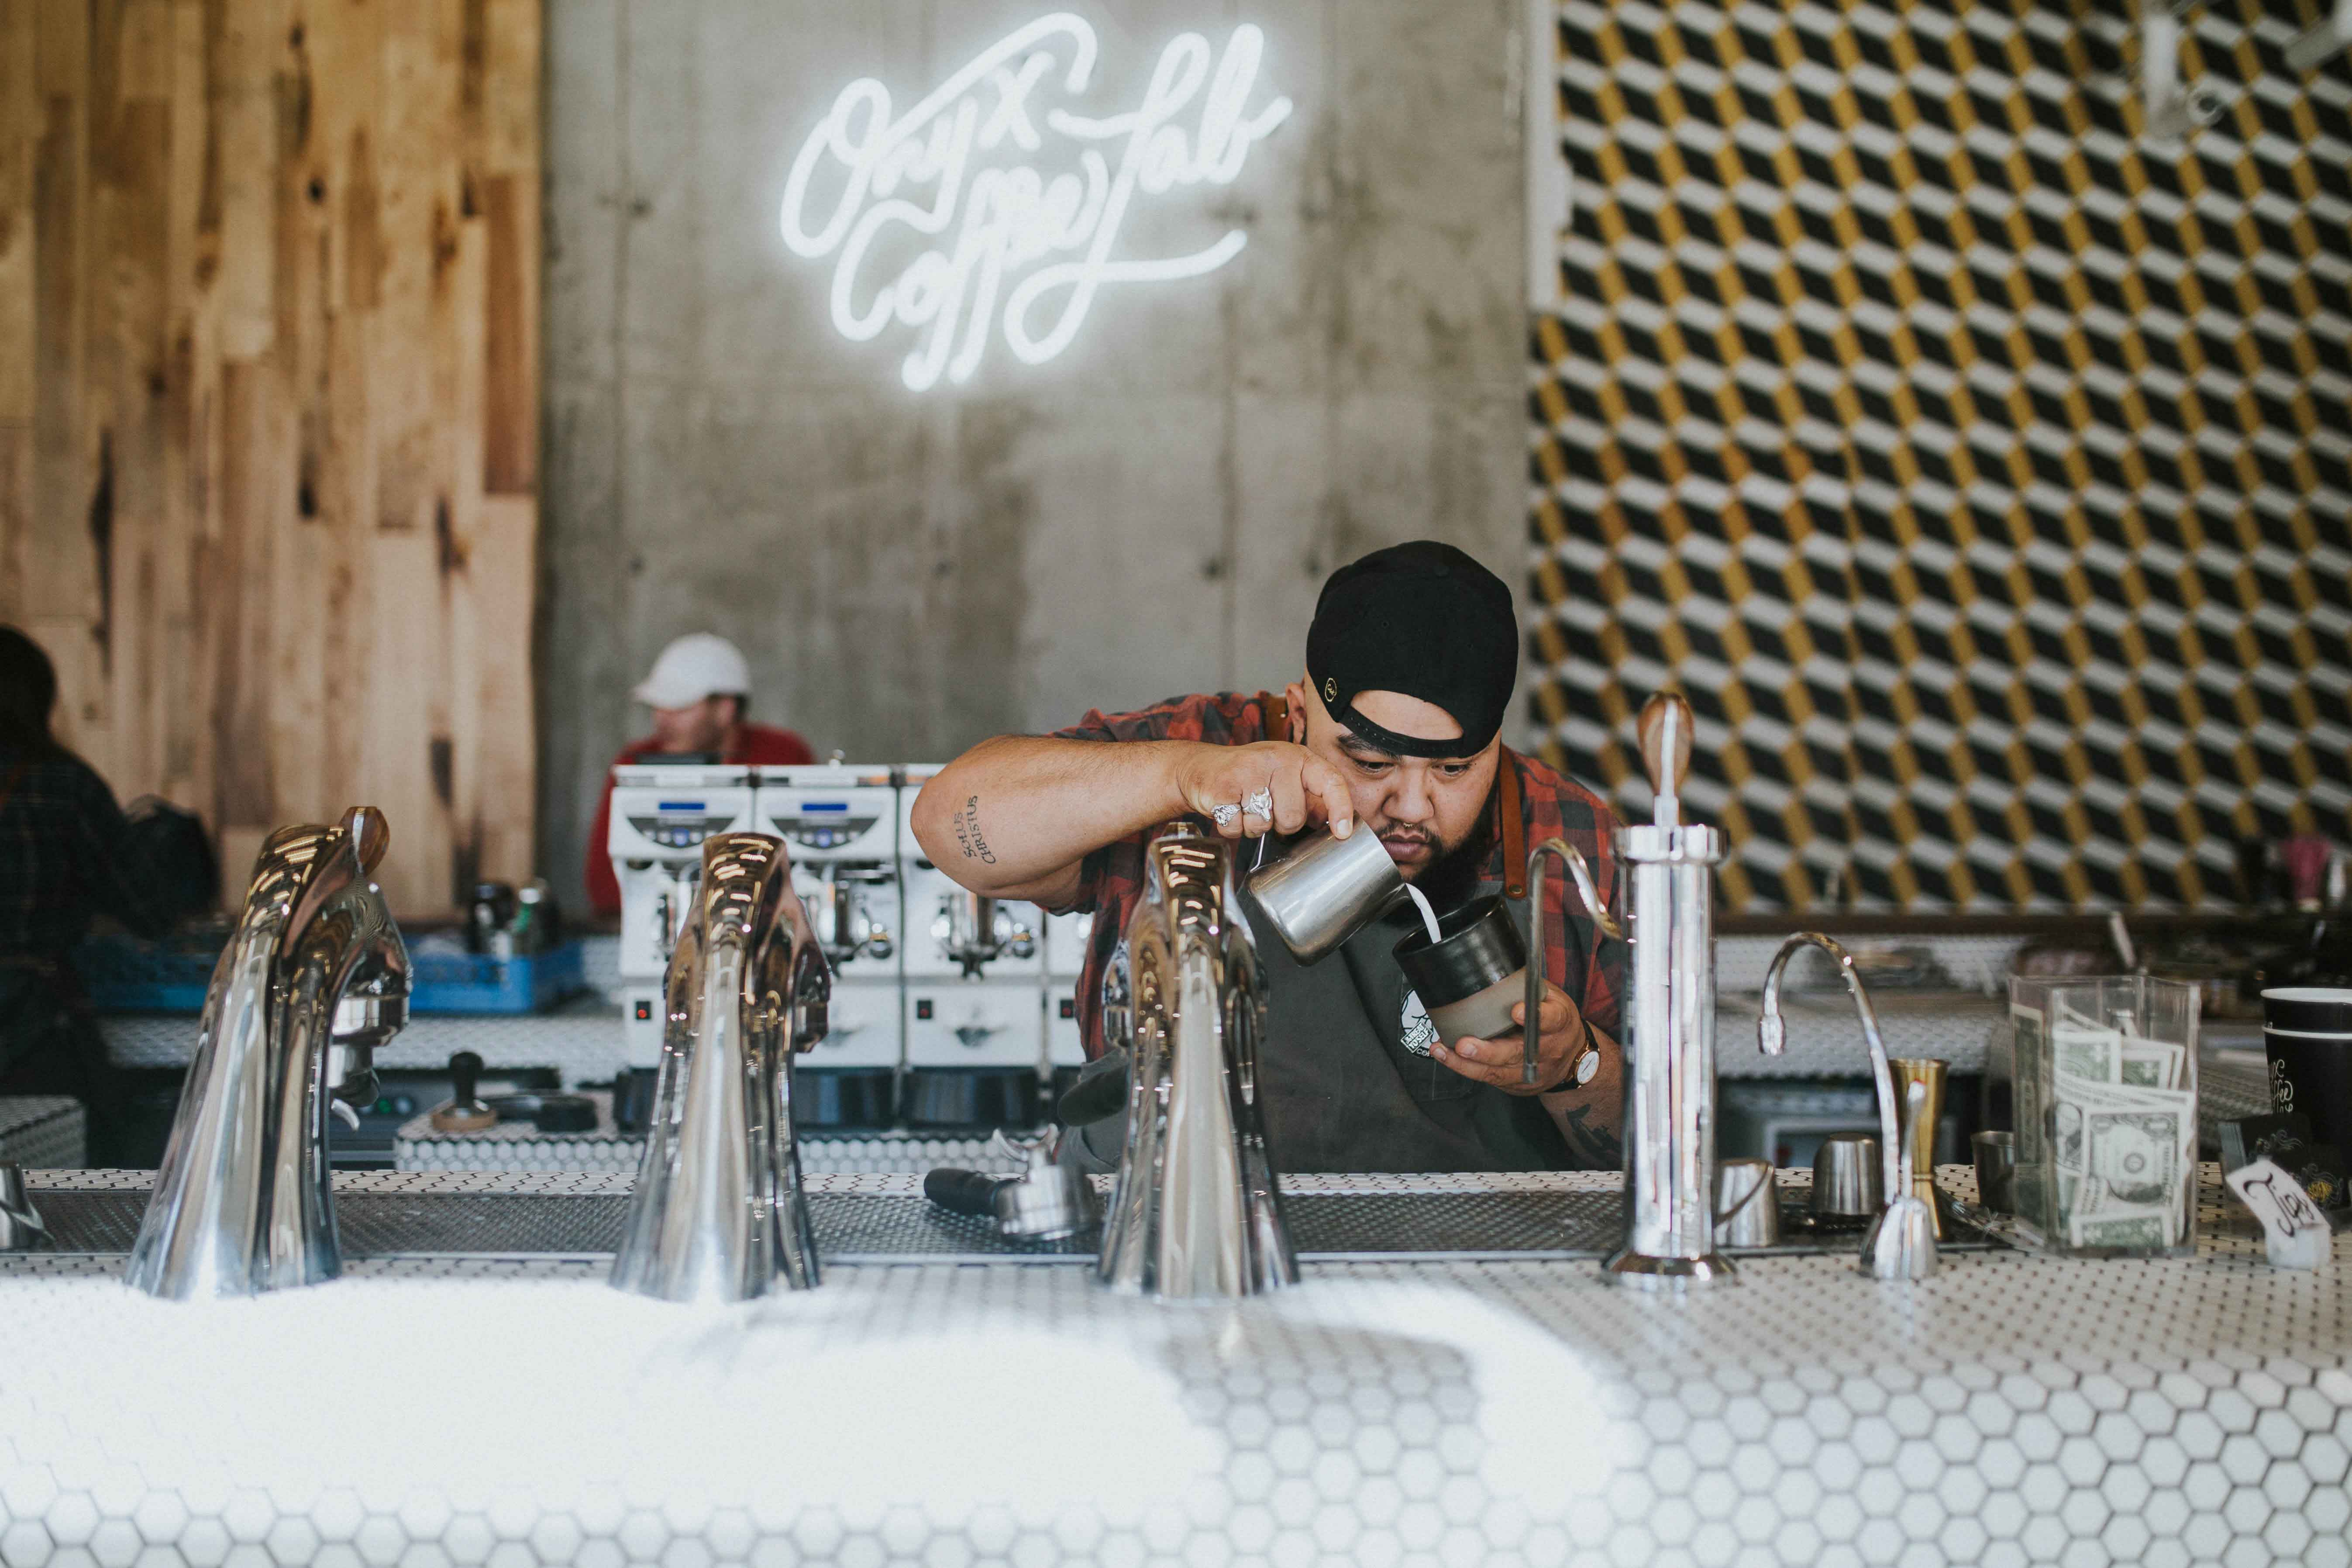 Chico preparando café en bar